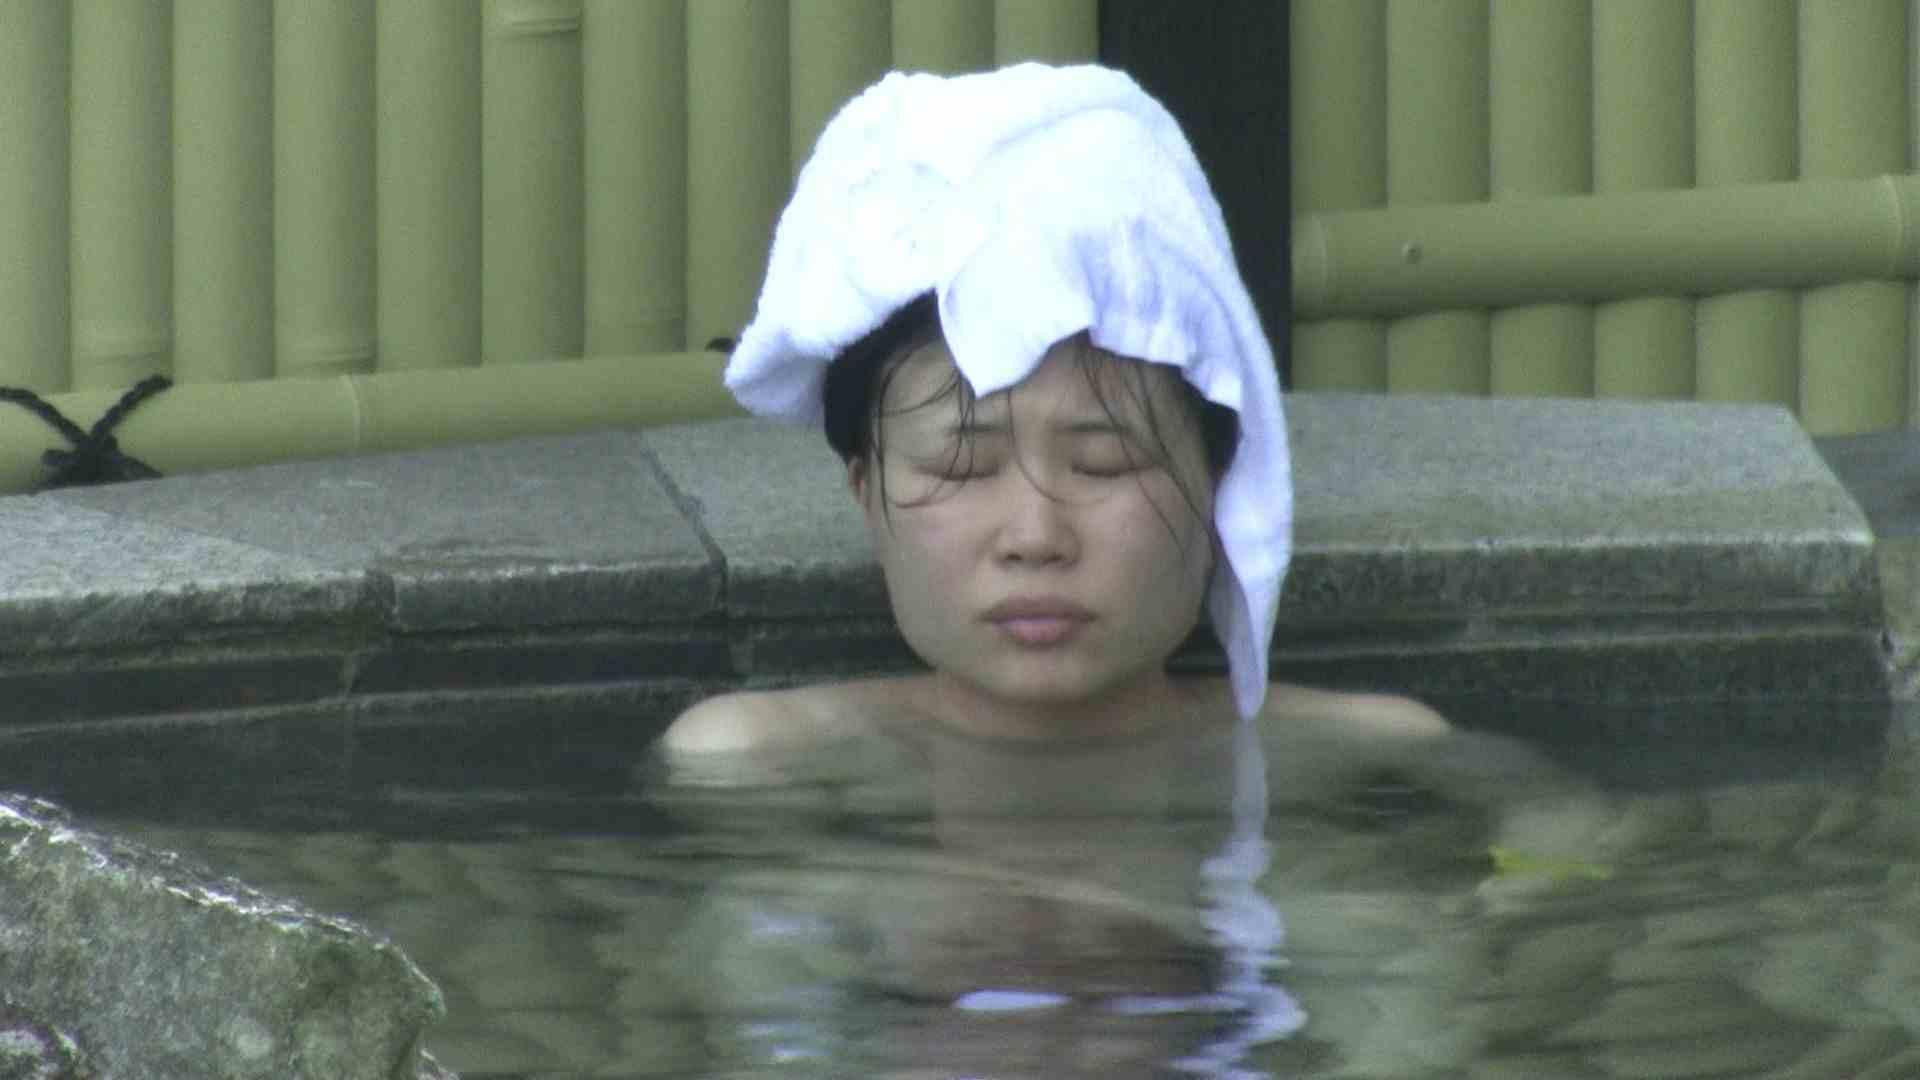 Aquaな露天風呂Vol.183 盗撮師作品 エロ無料画像 105pic 80